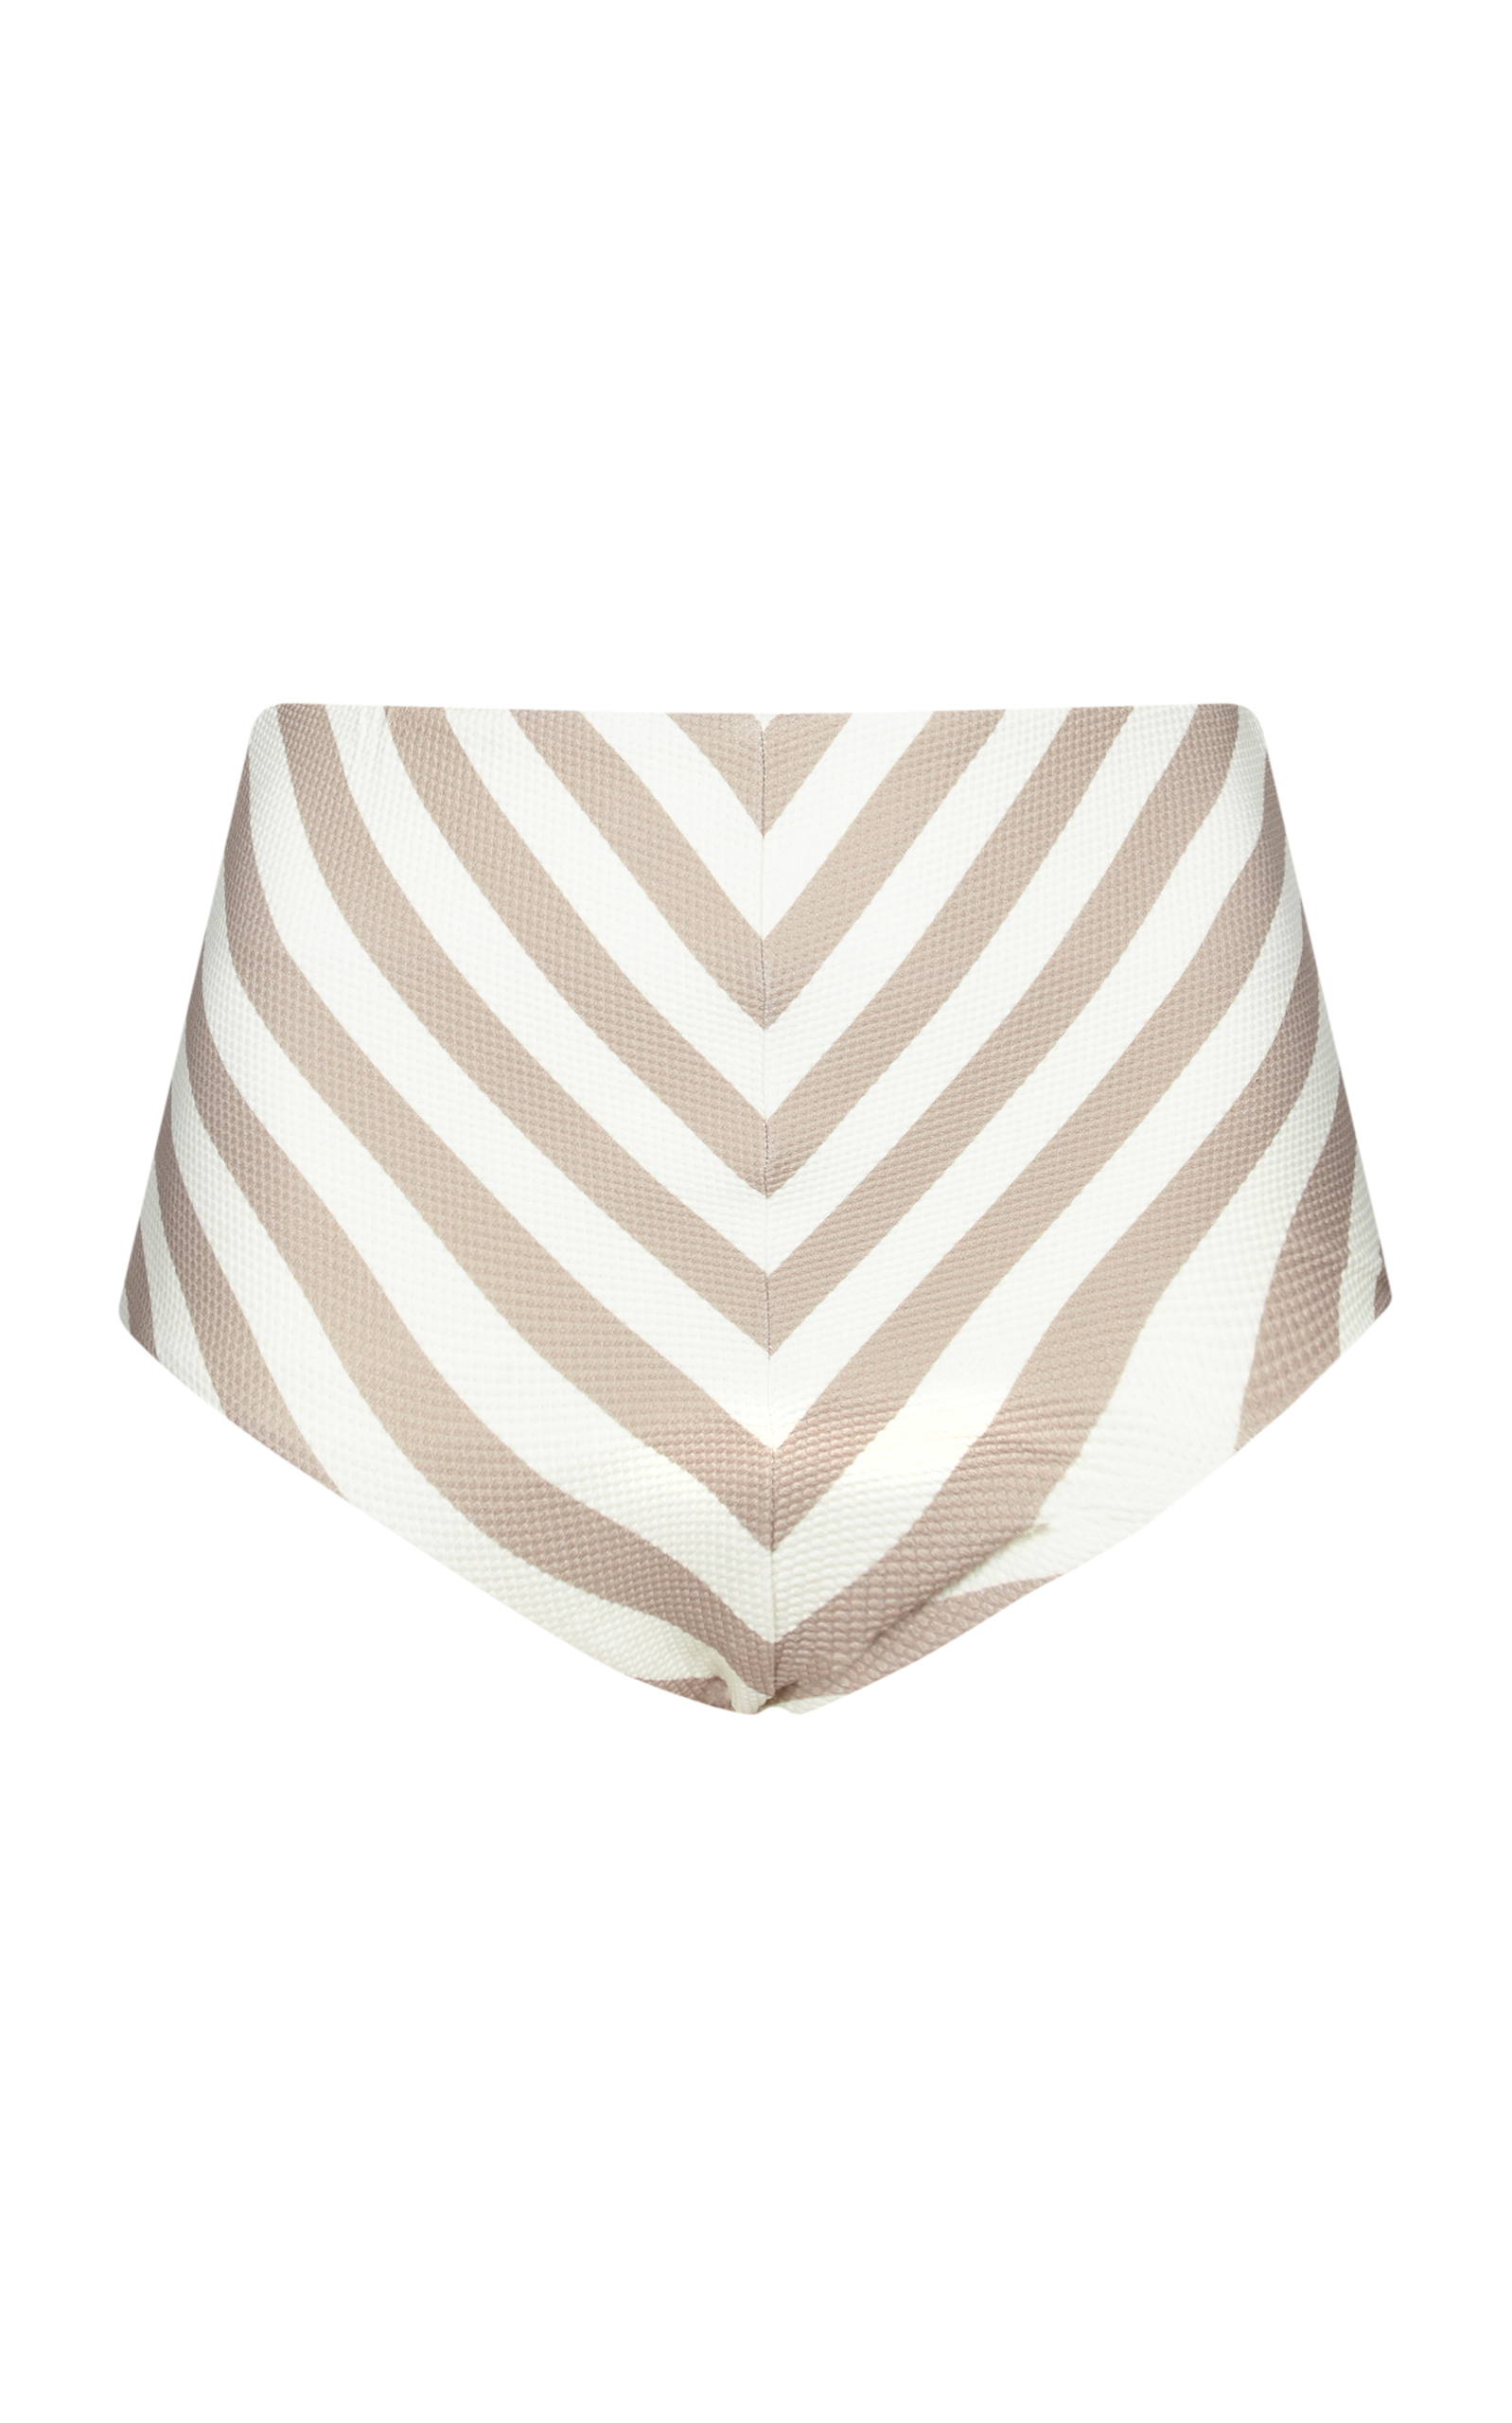 89ae8a1f4b Fiji High Waist Bikini Bottom by PAPER LONDON